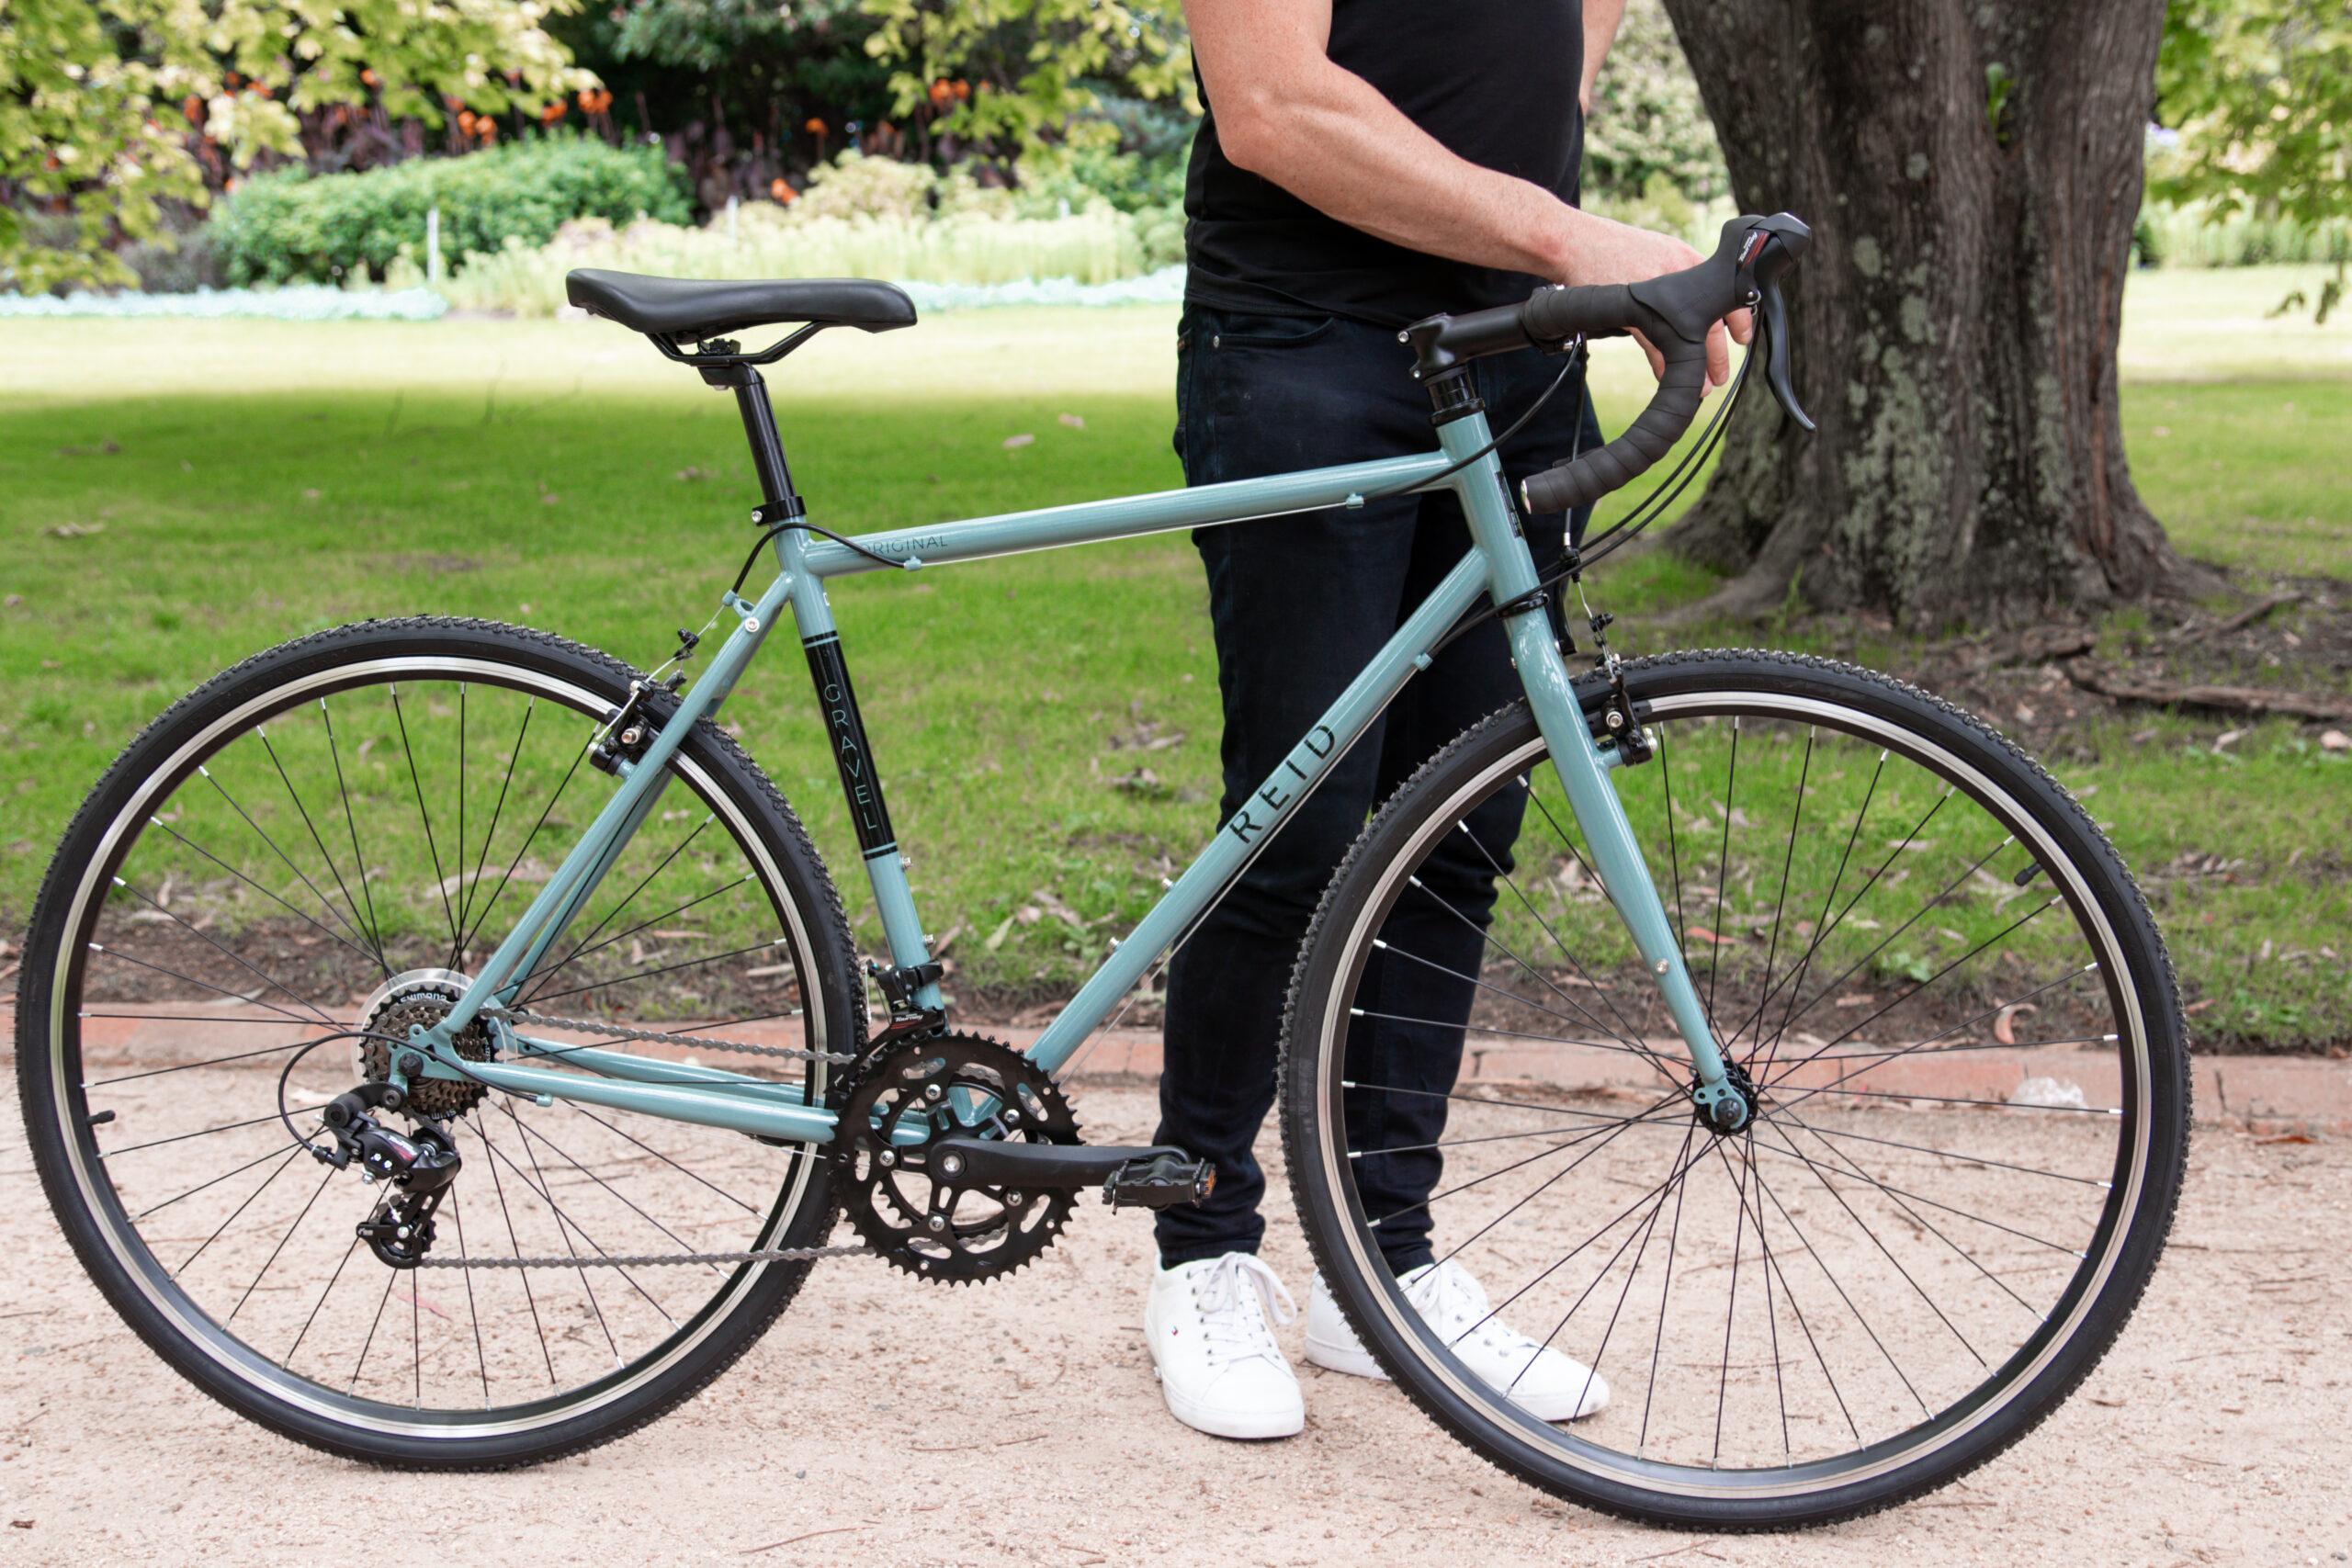 IMG 4264 scaled - Reid ® - Original Gravel Bike